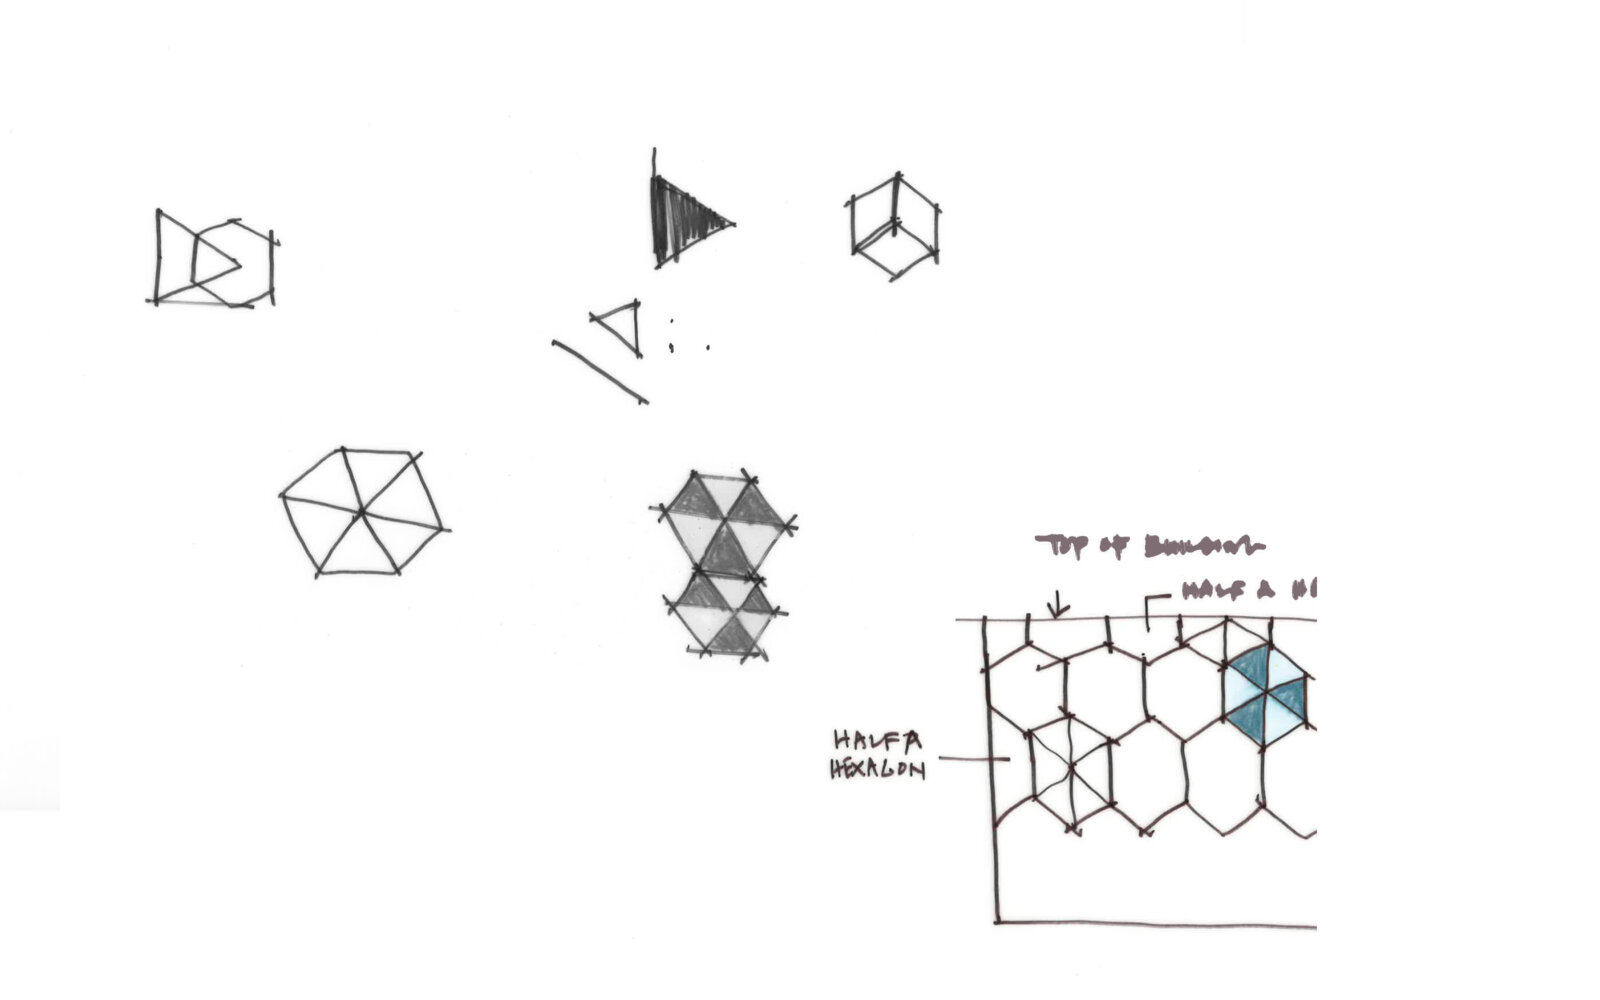 The Aurora Centre concept sketch